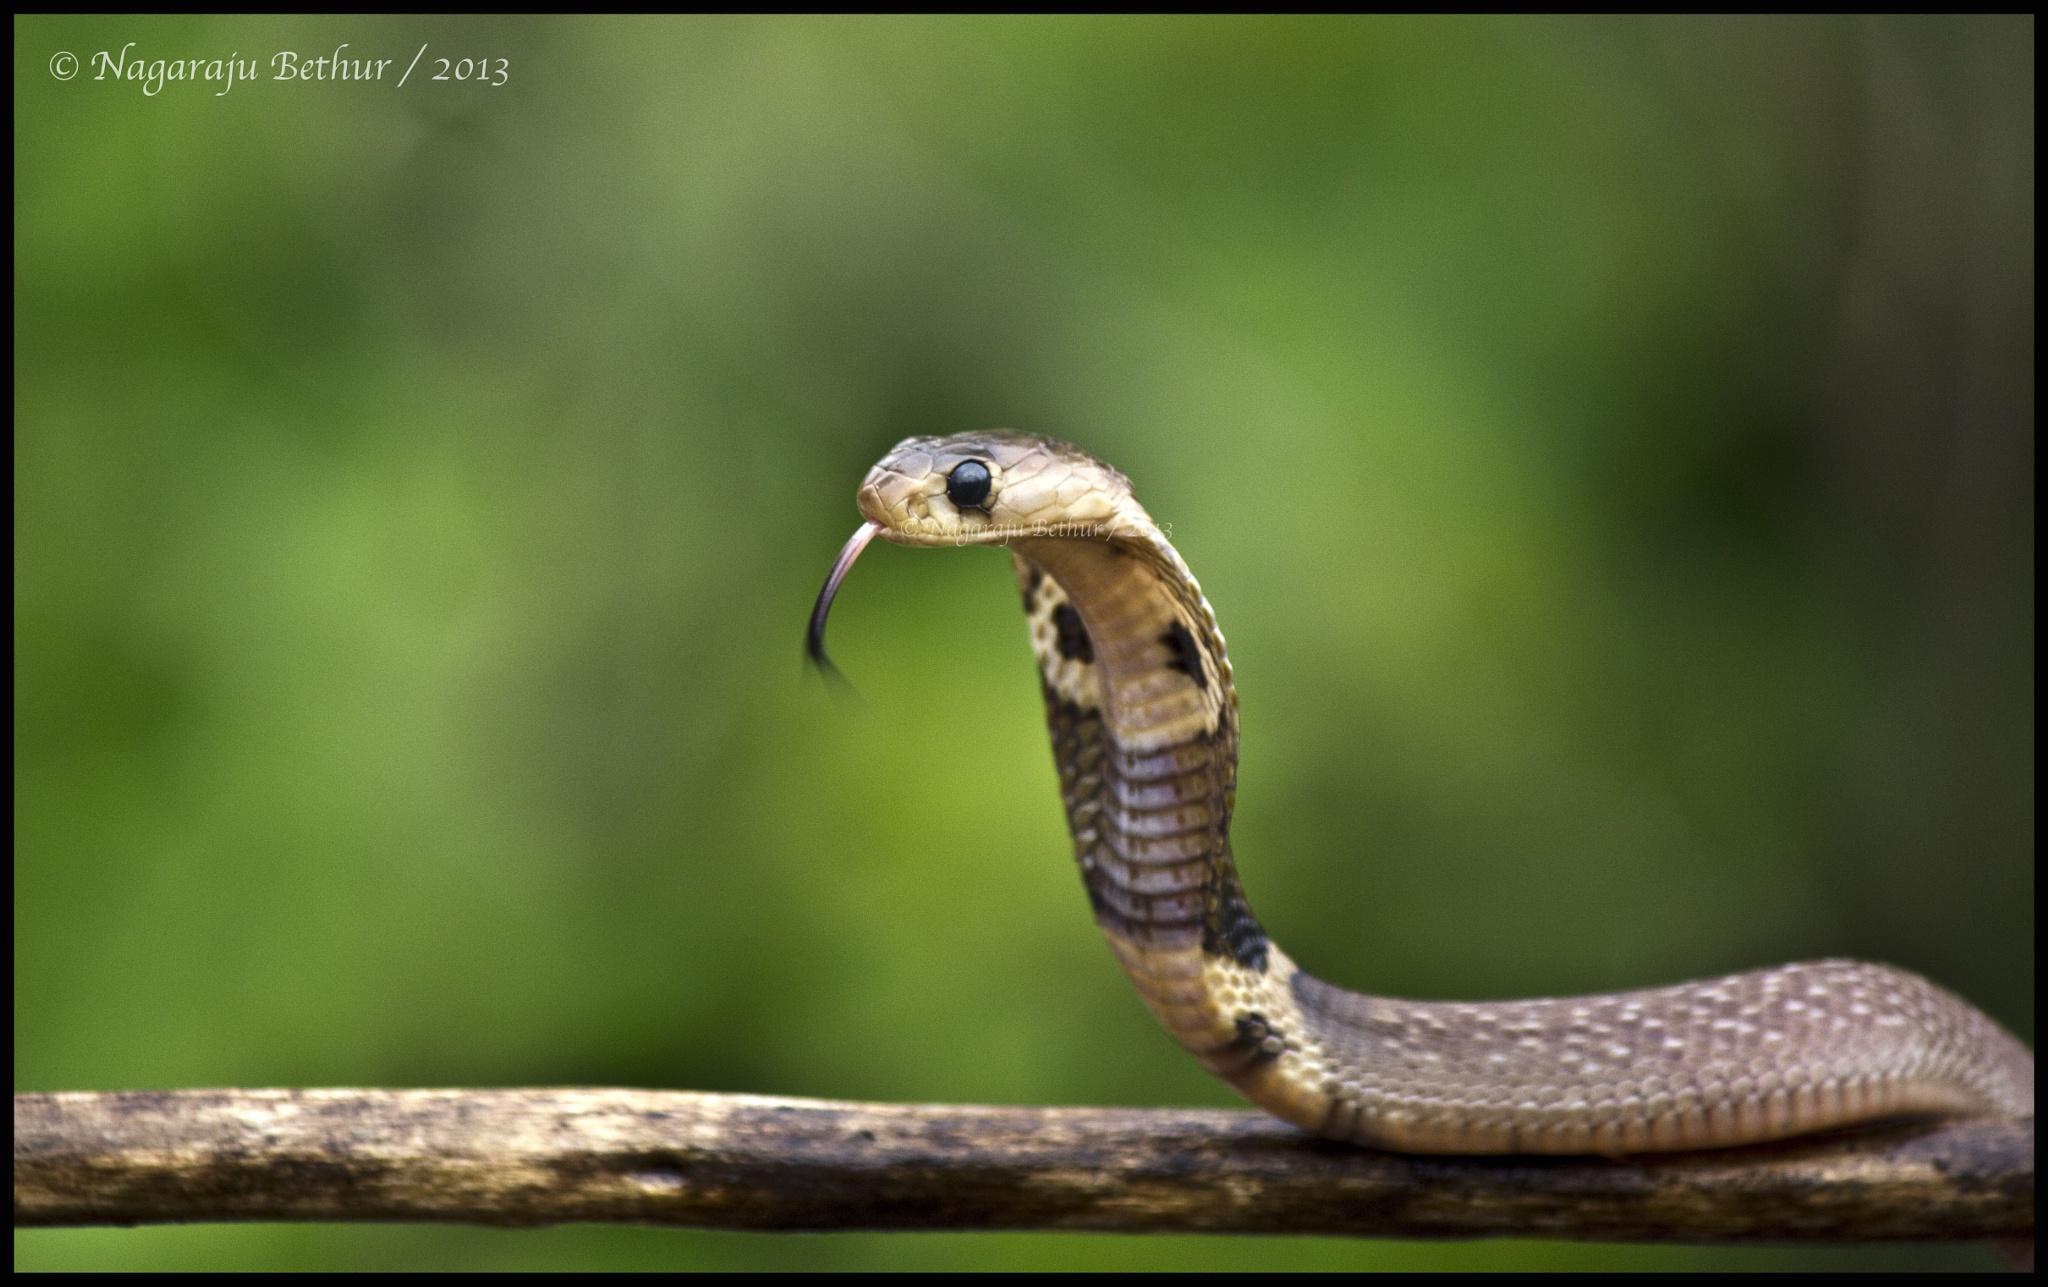 Spectacled cobra by nagaraju